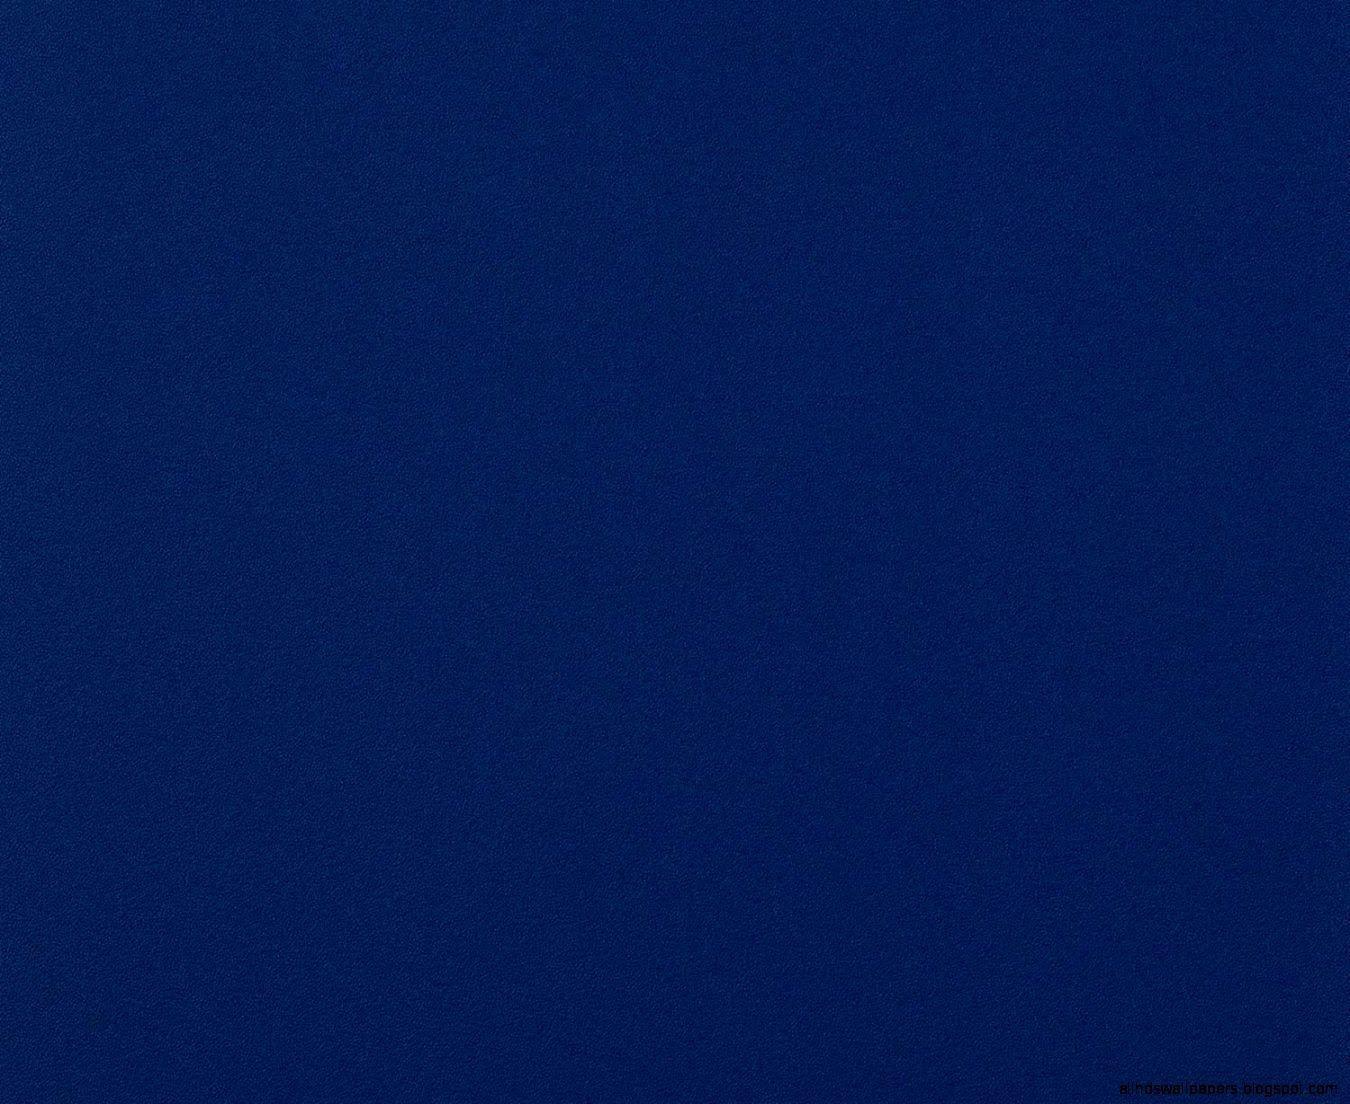 Plane Blue Hd Wallpapers Wallpaper Cave